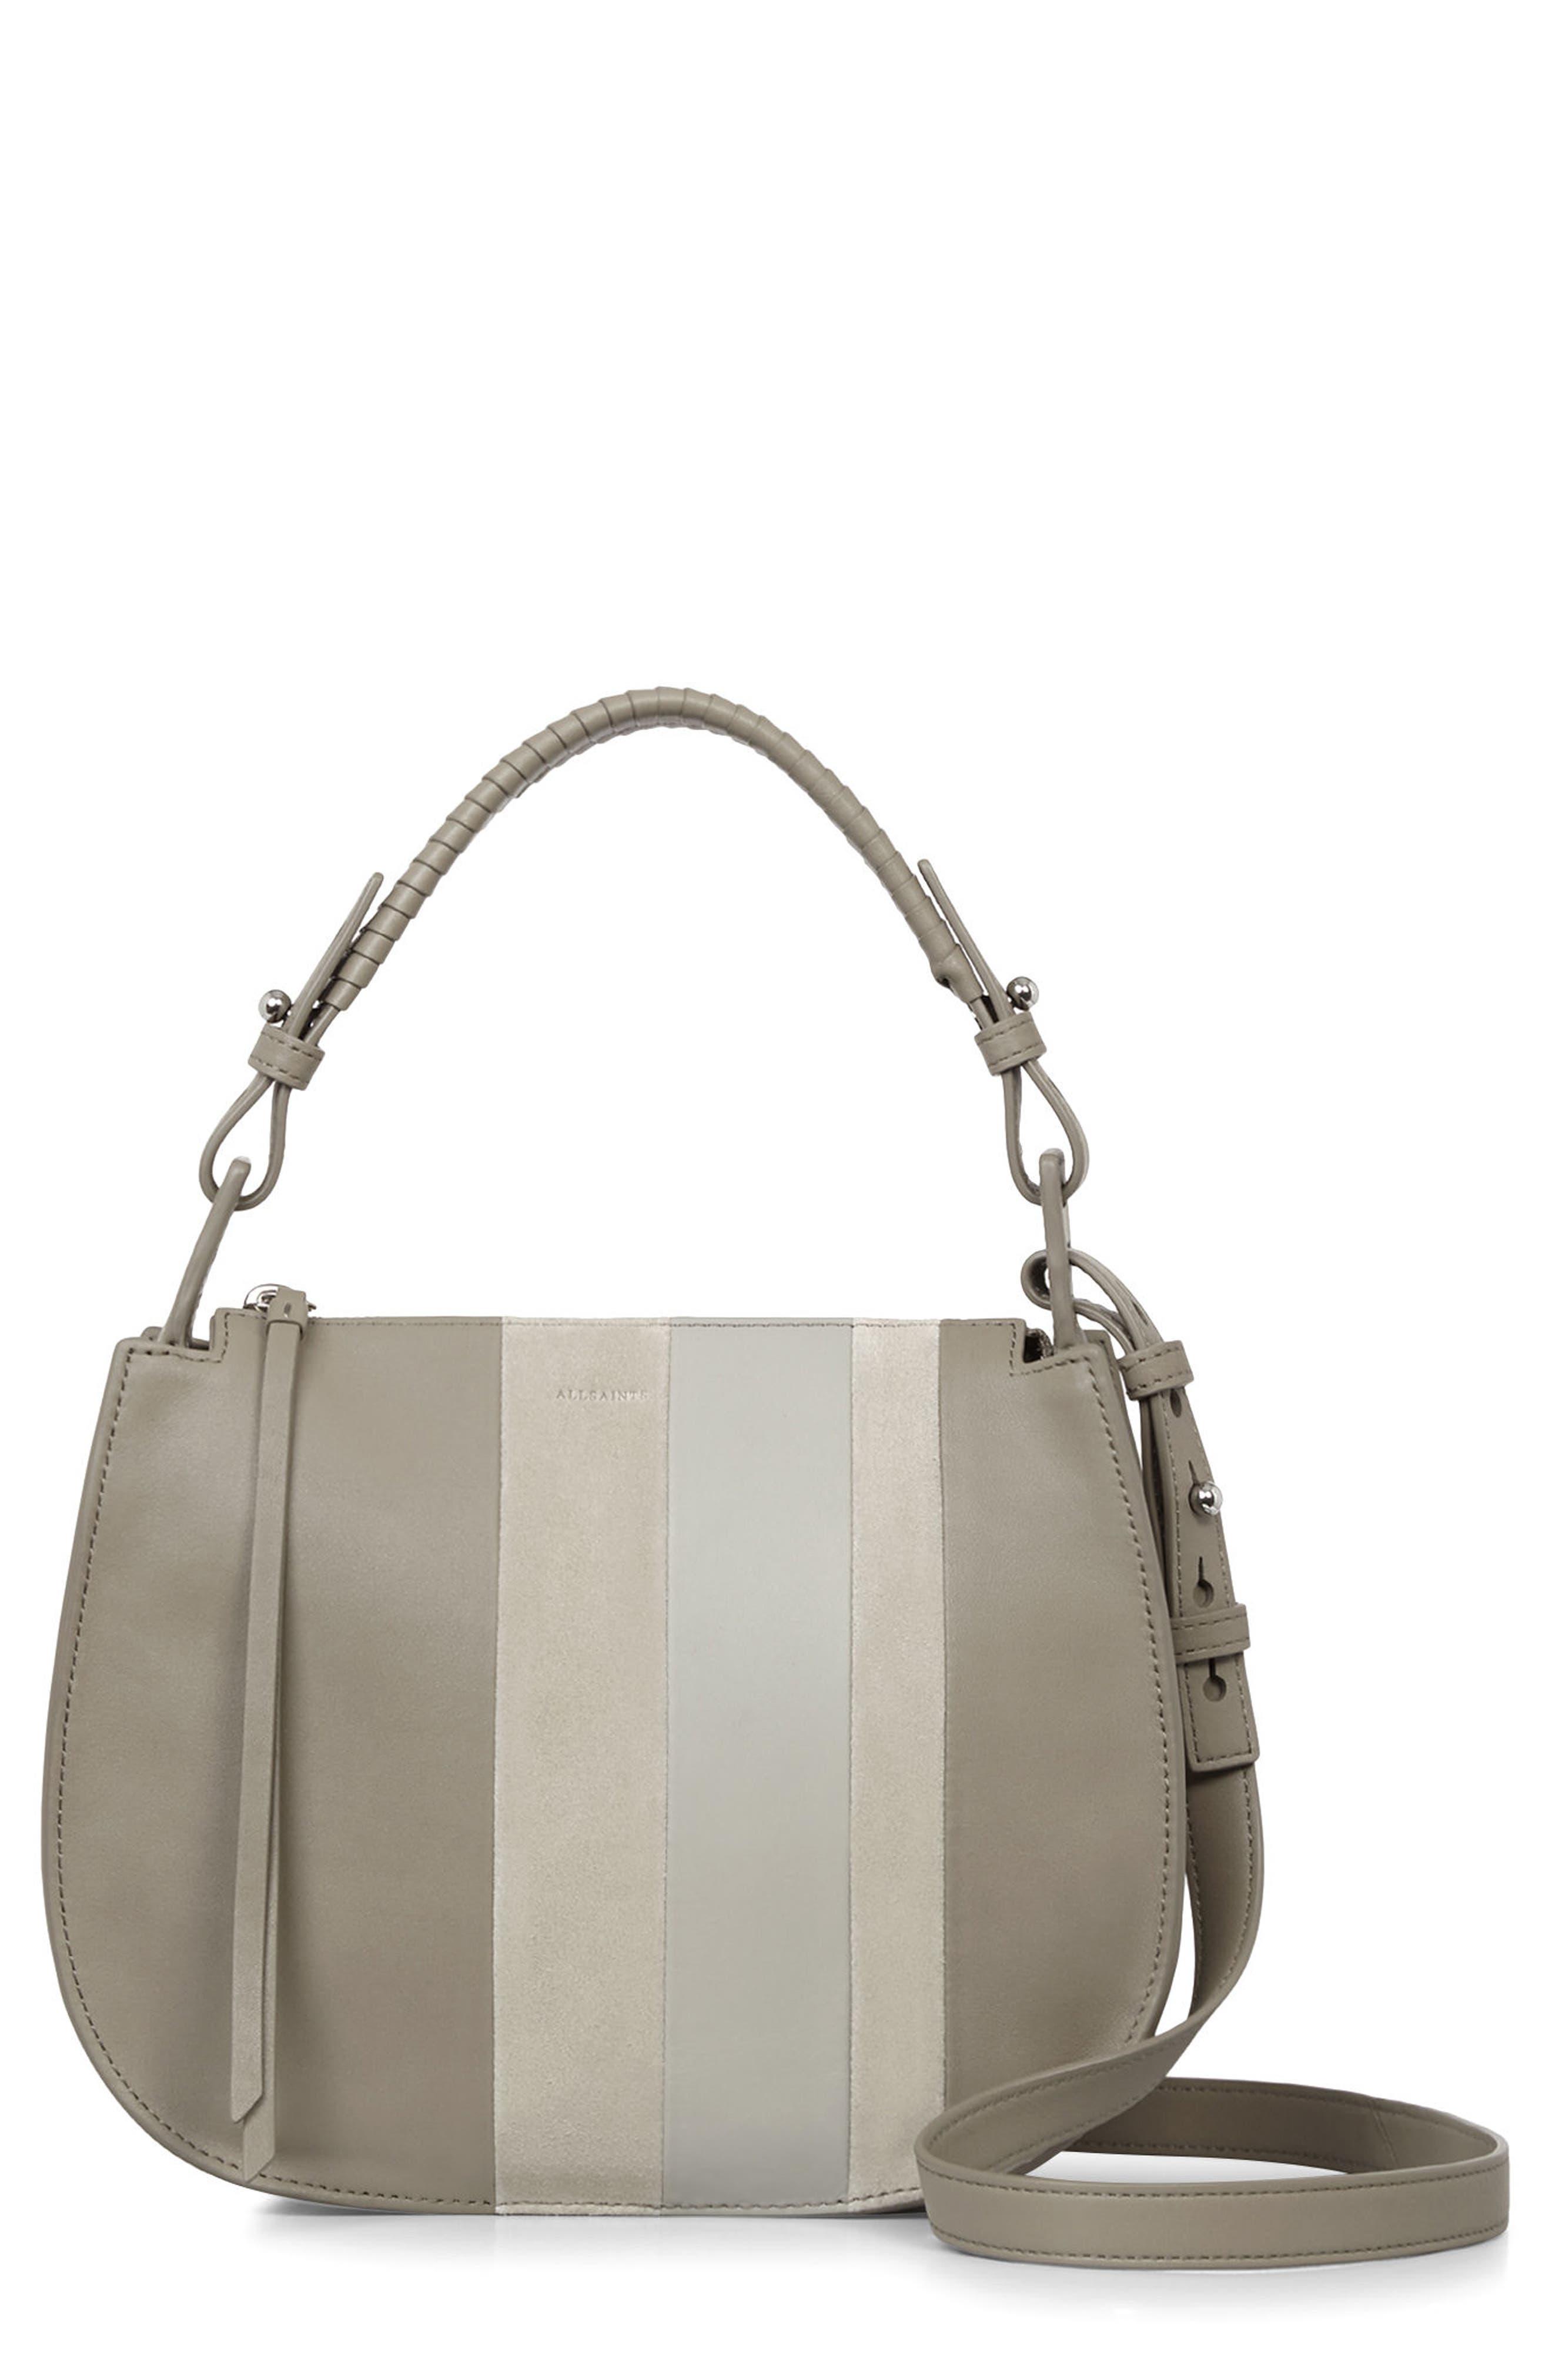 Casey Lea Calfskin Leather & Suede Hobo,                         Main,                         color, 250